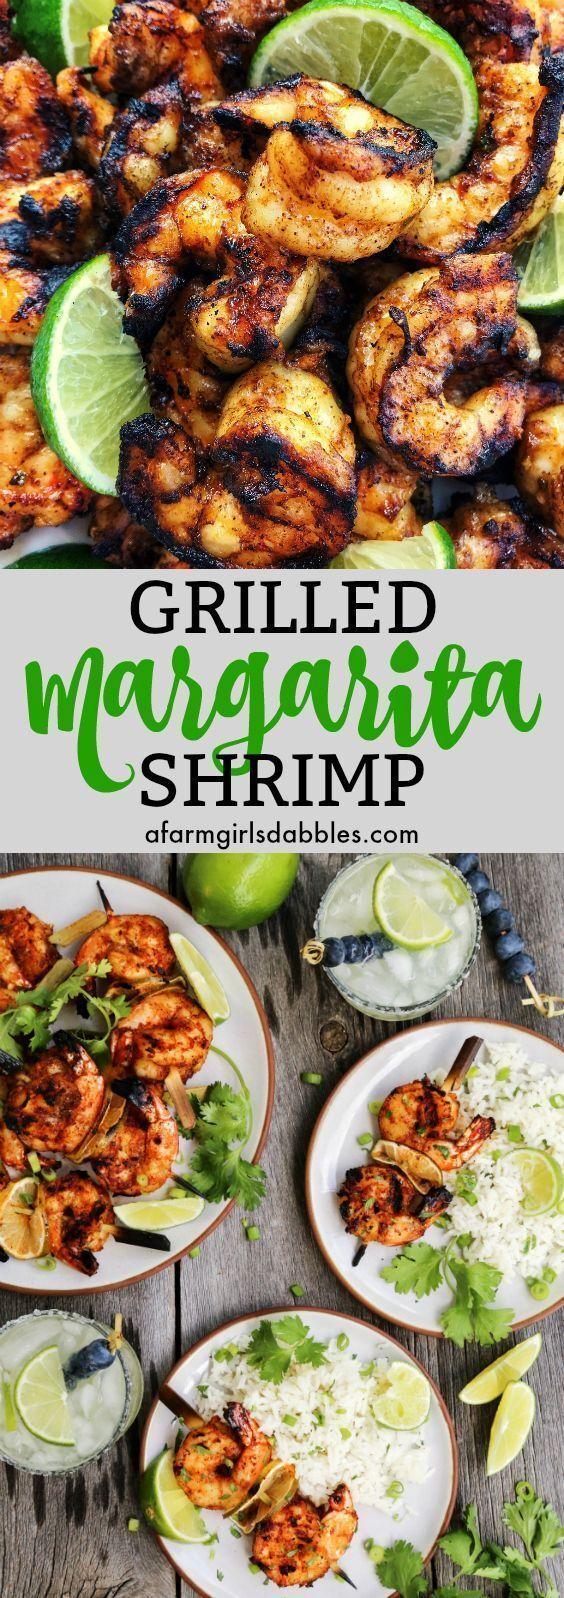 Photo of Grilled Margarita Shrimp